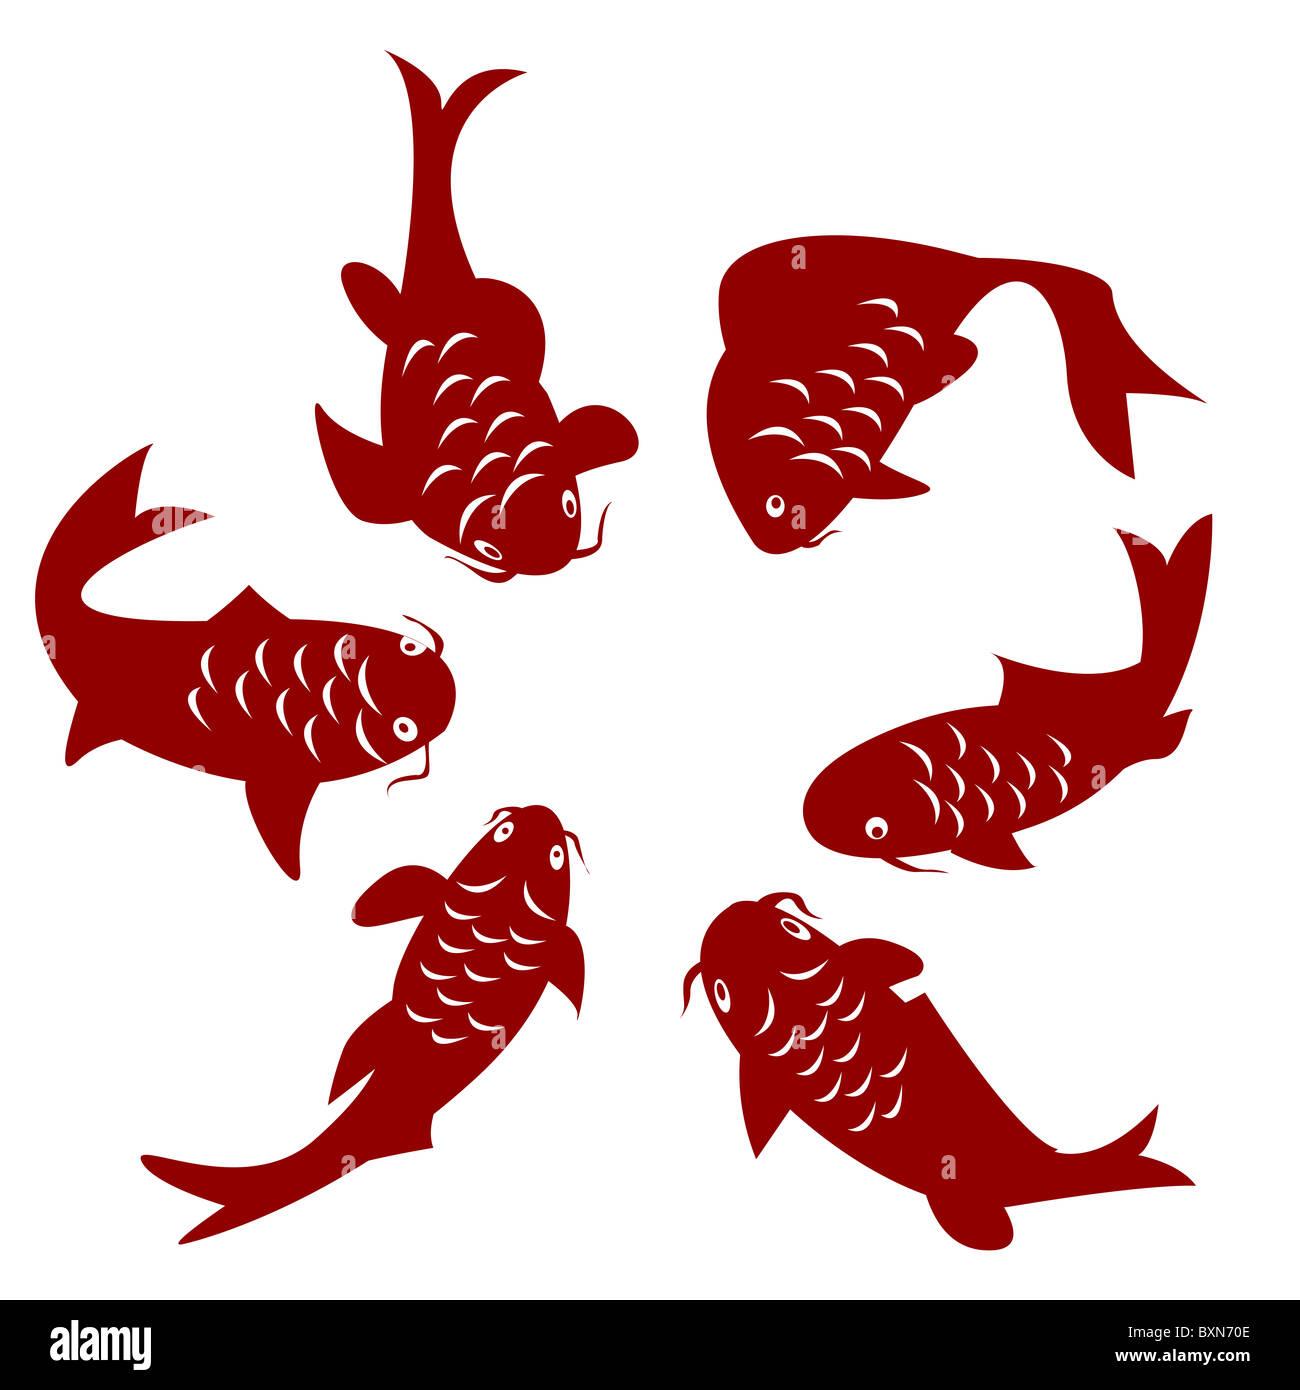 Koi fish - Stock Image